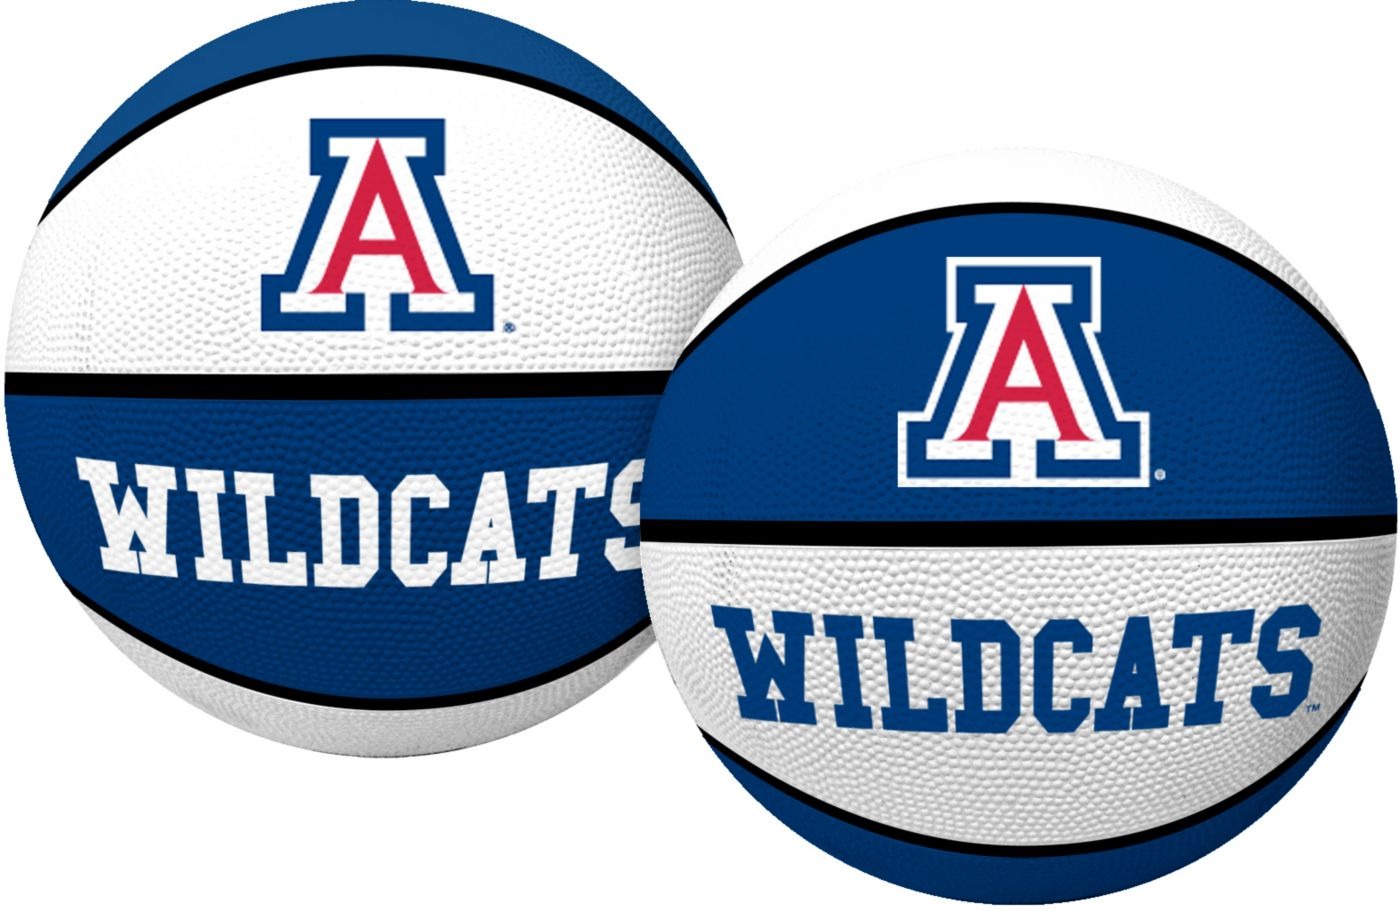 Rawlings Arizona Wildcats Crossover Full-Size Basketball